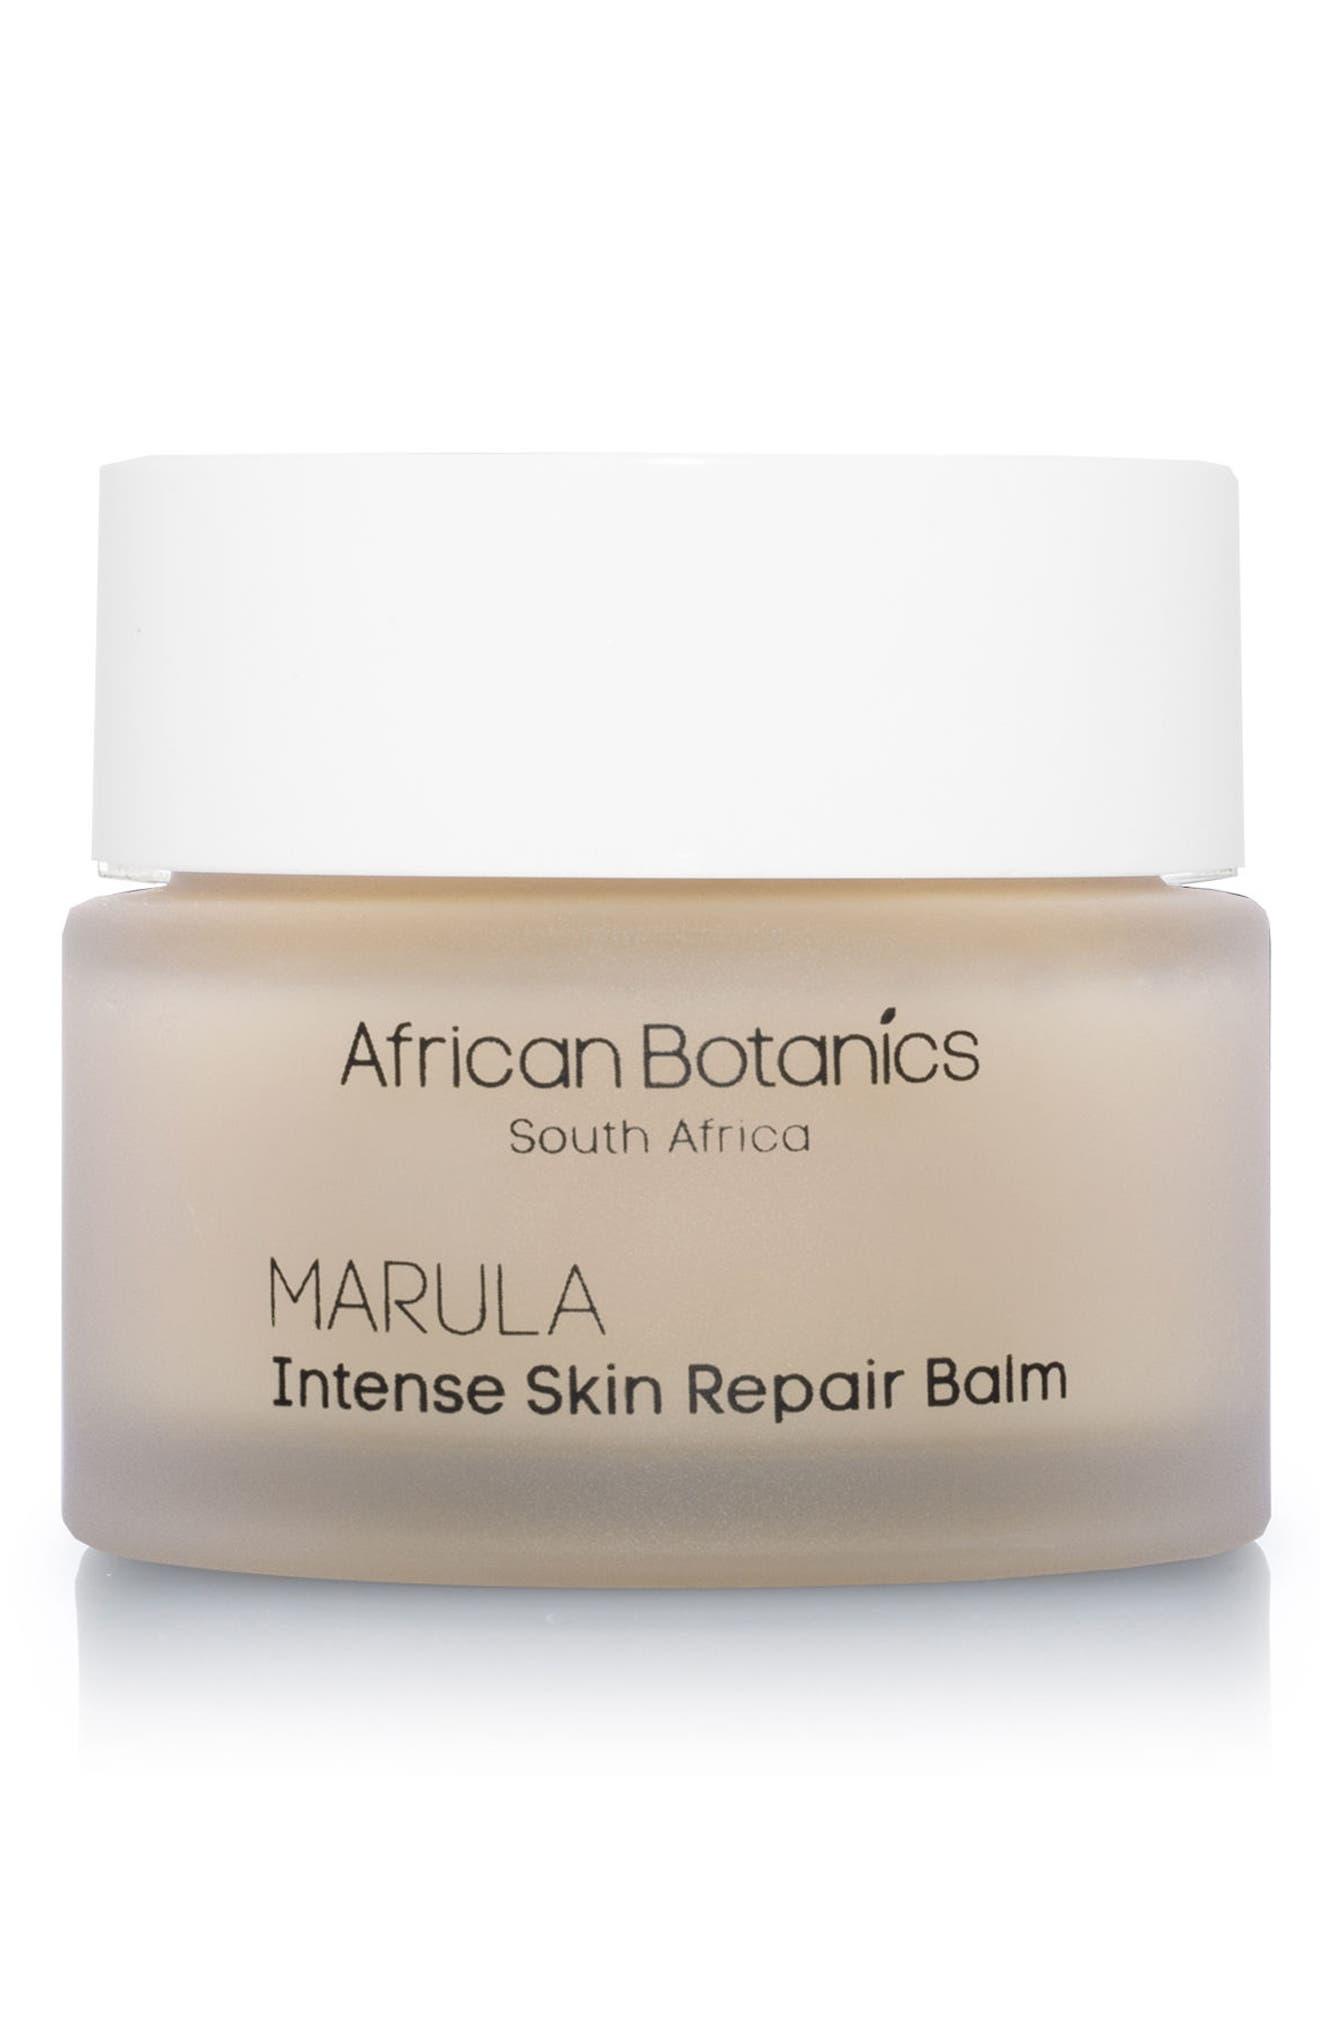 Marula Intense Skin Repair Balm,                             Main thumbnail 1, color,                             No Color